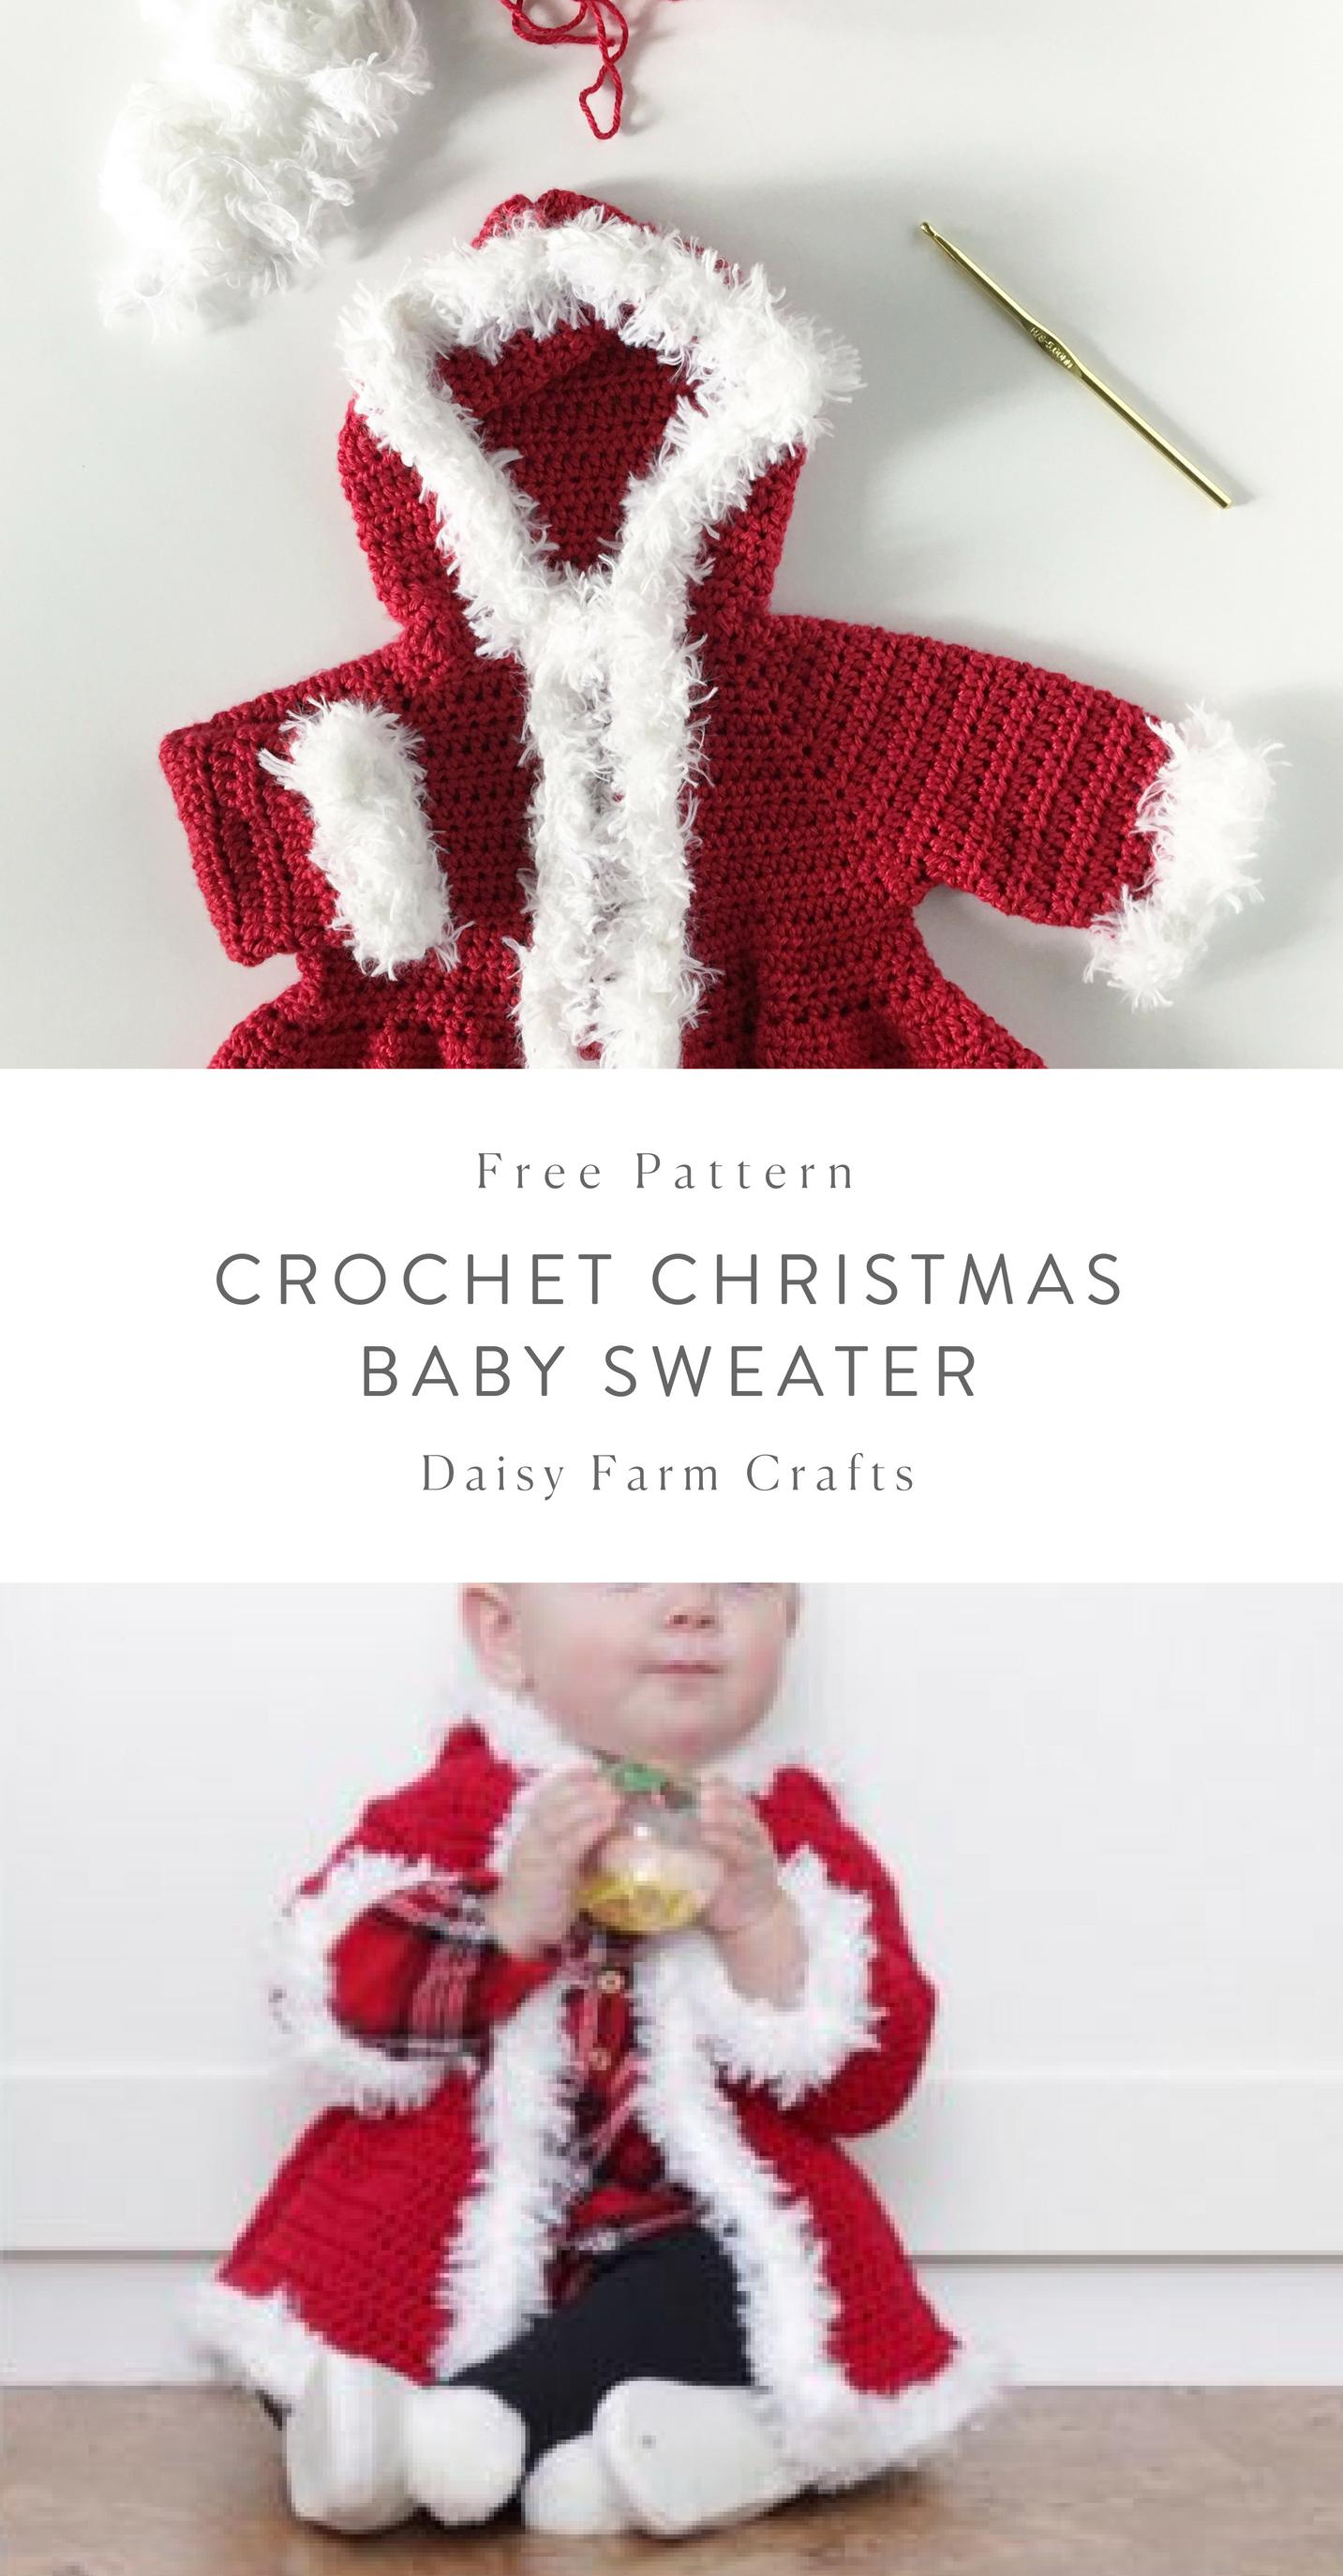 Free Pattern - Crochet Christmas Baby Sweater #crochet   BEBES ...